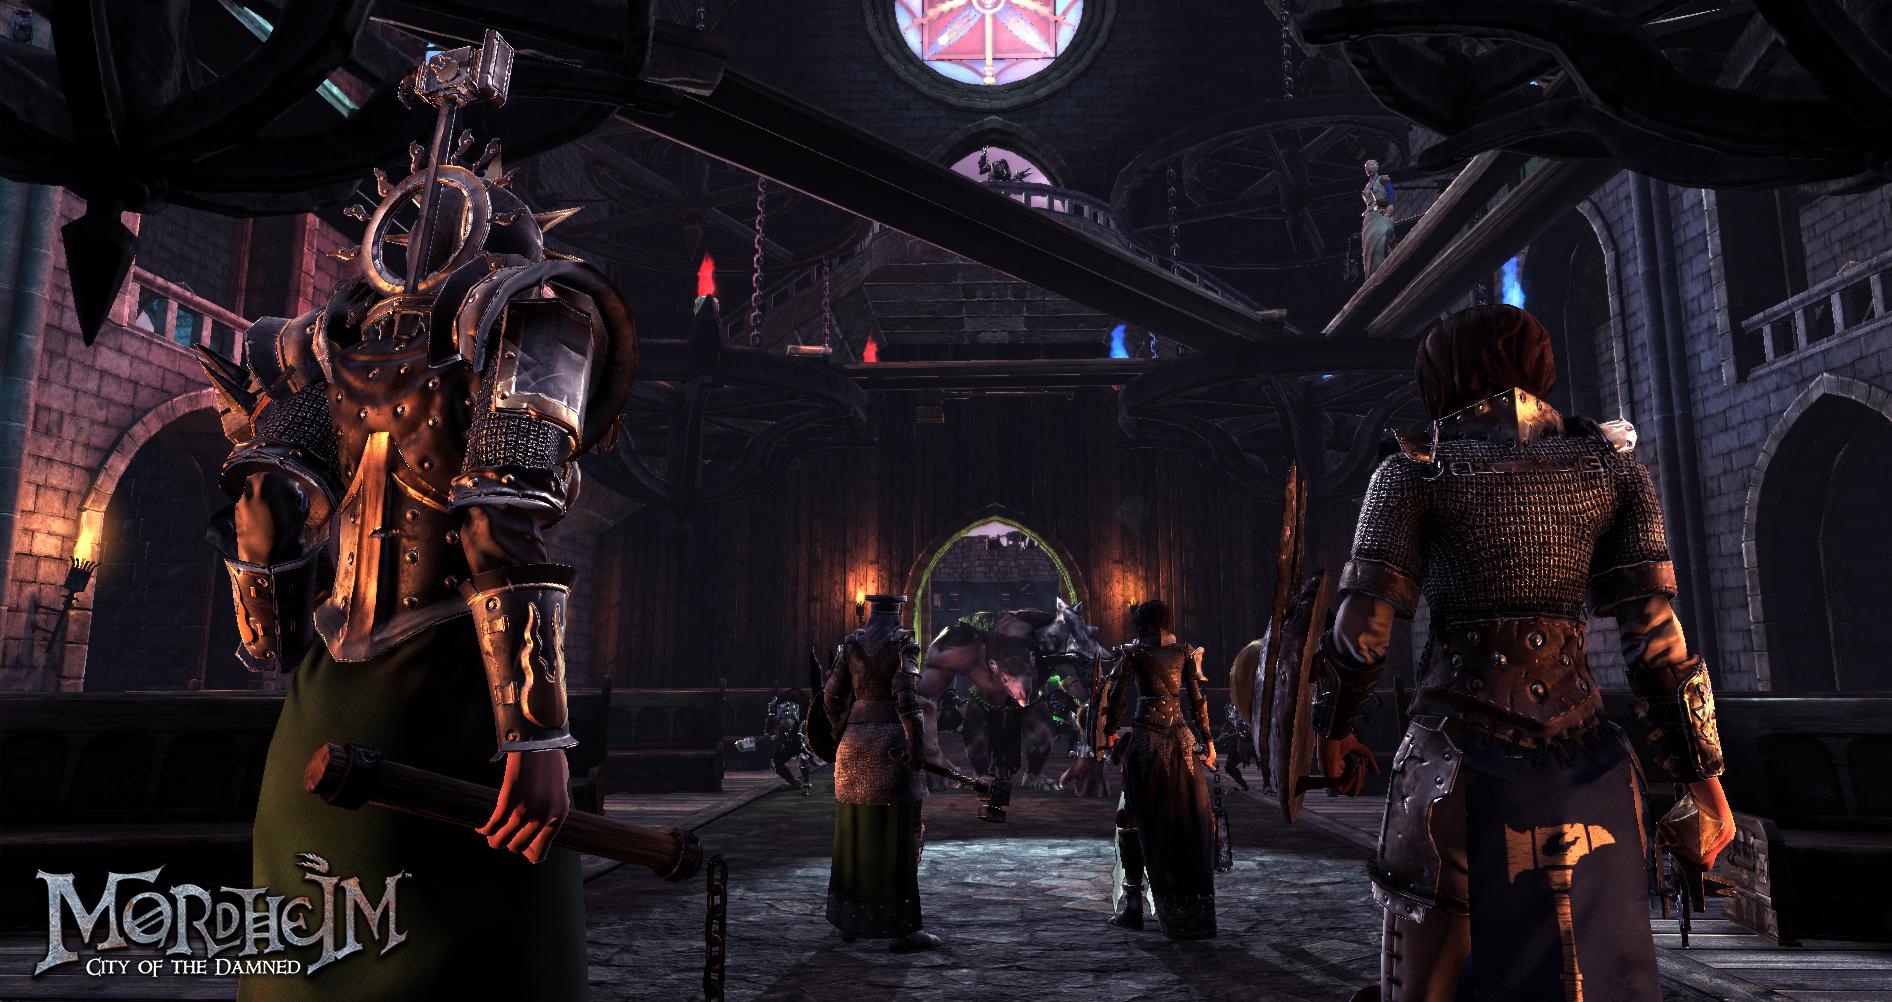 [Jeu vidéo] Mordheim : City of the Damned (PC) 249153Mordheim10